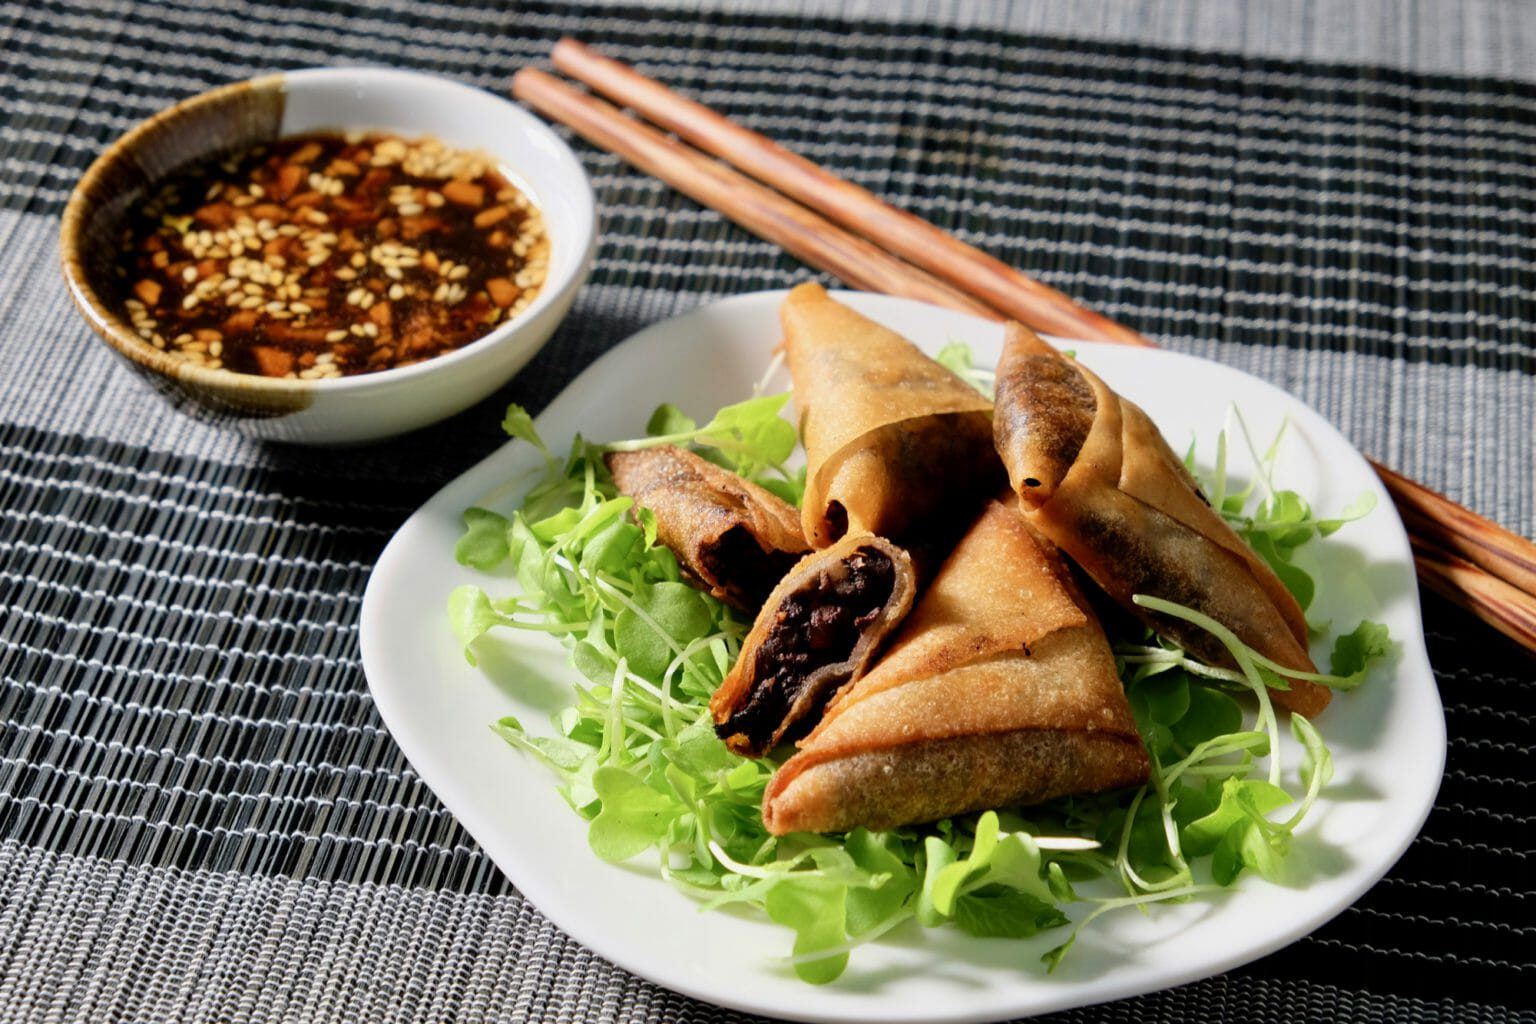 black-pudding-apple-parcels-ginger-garlic-dipping-sauce